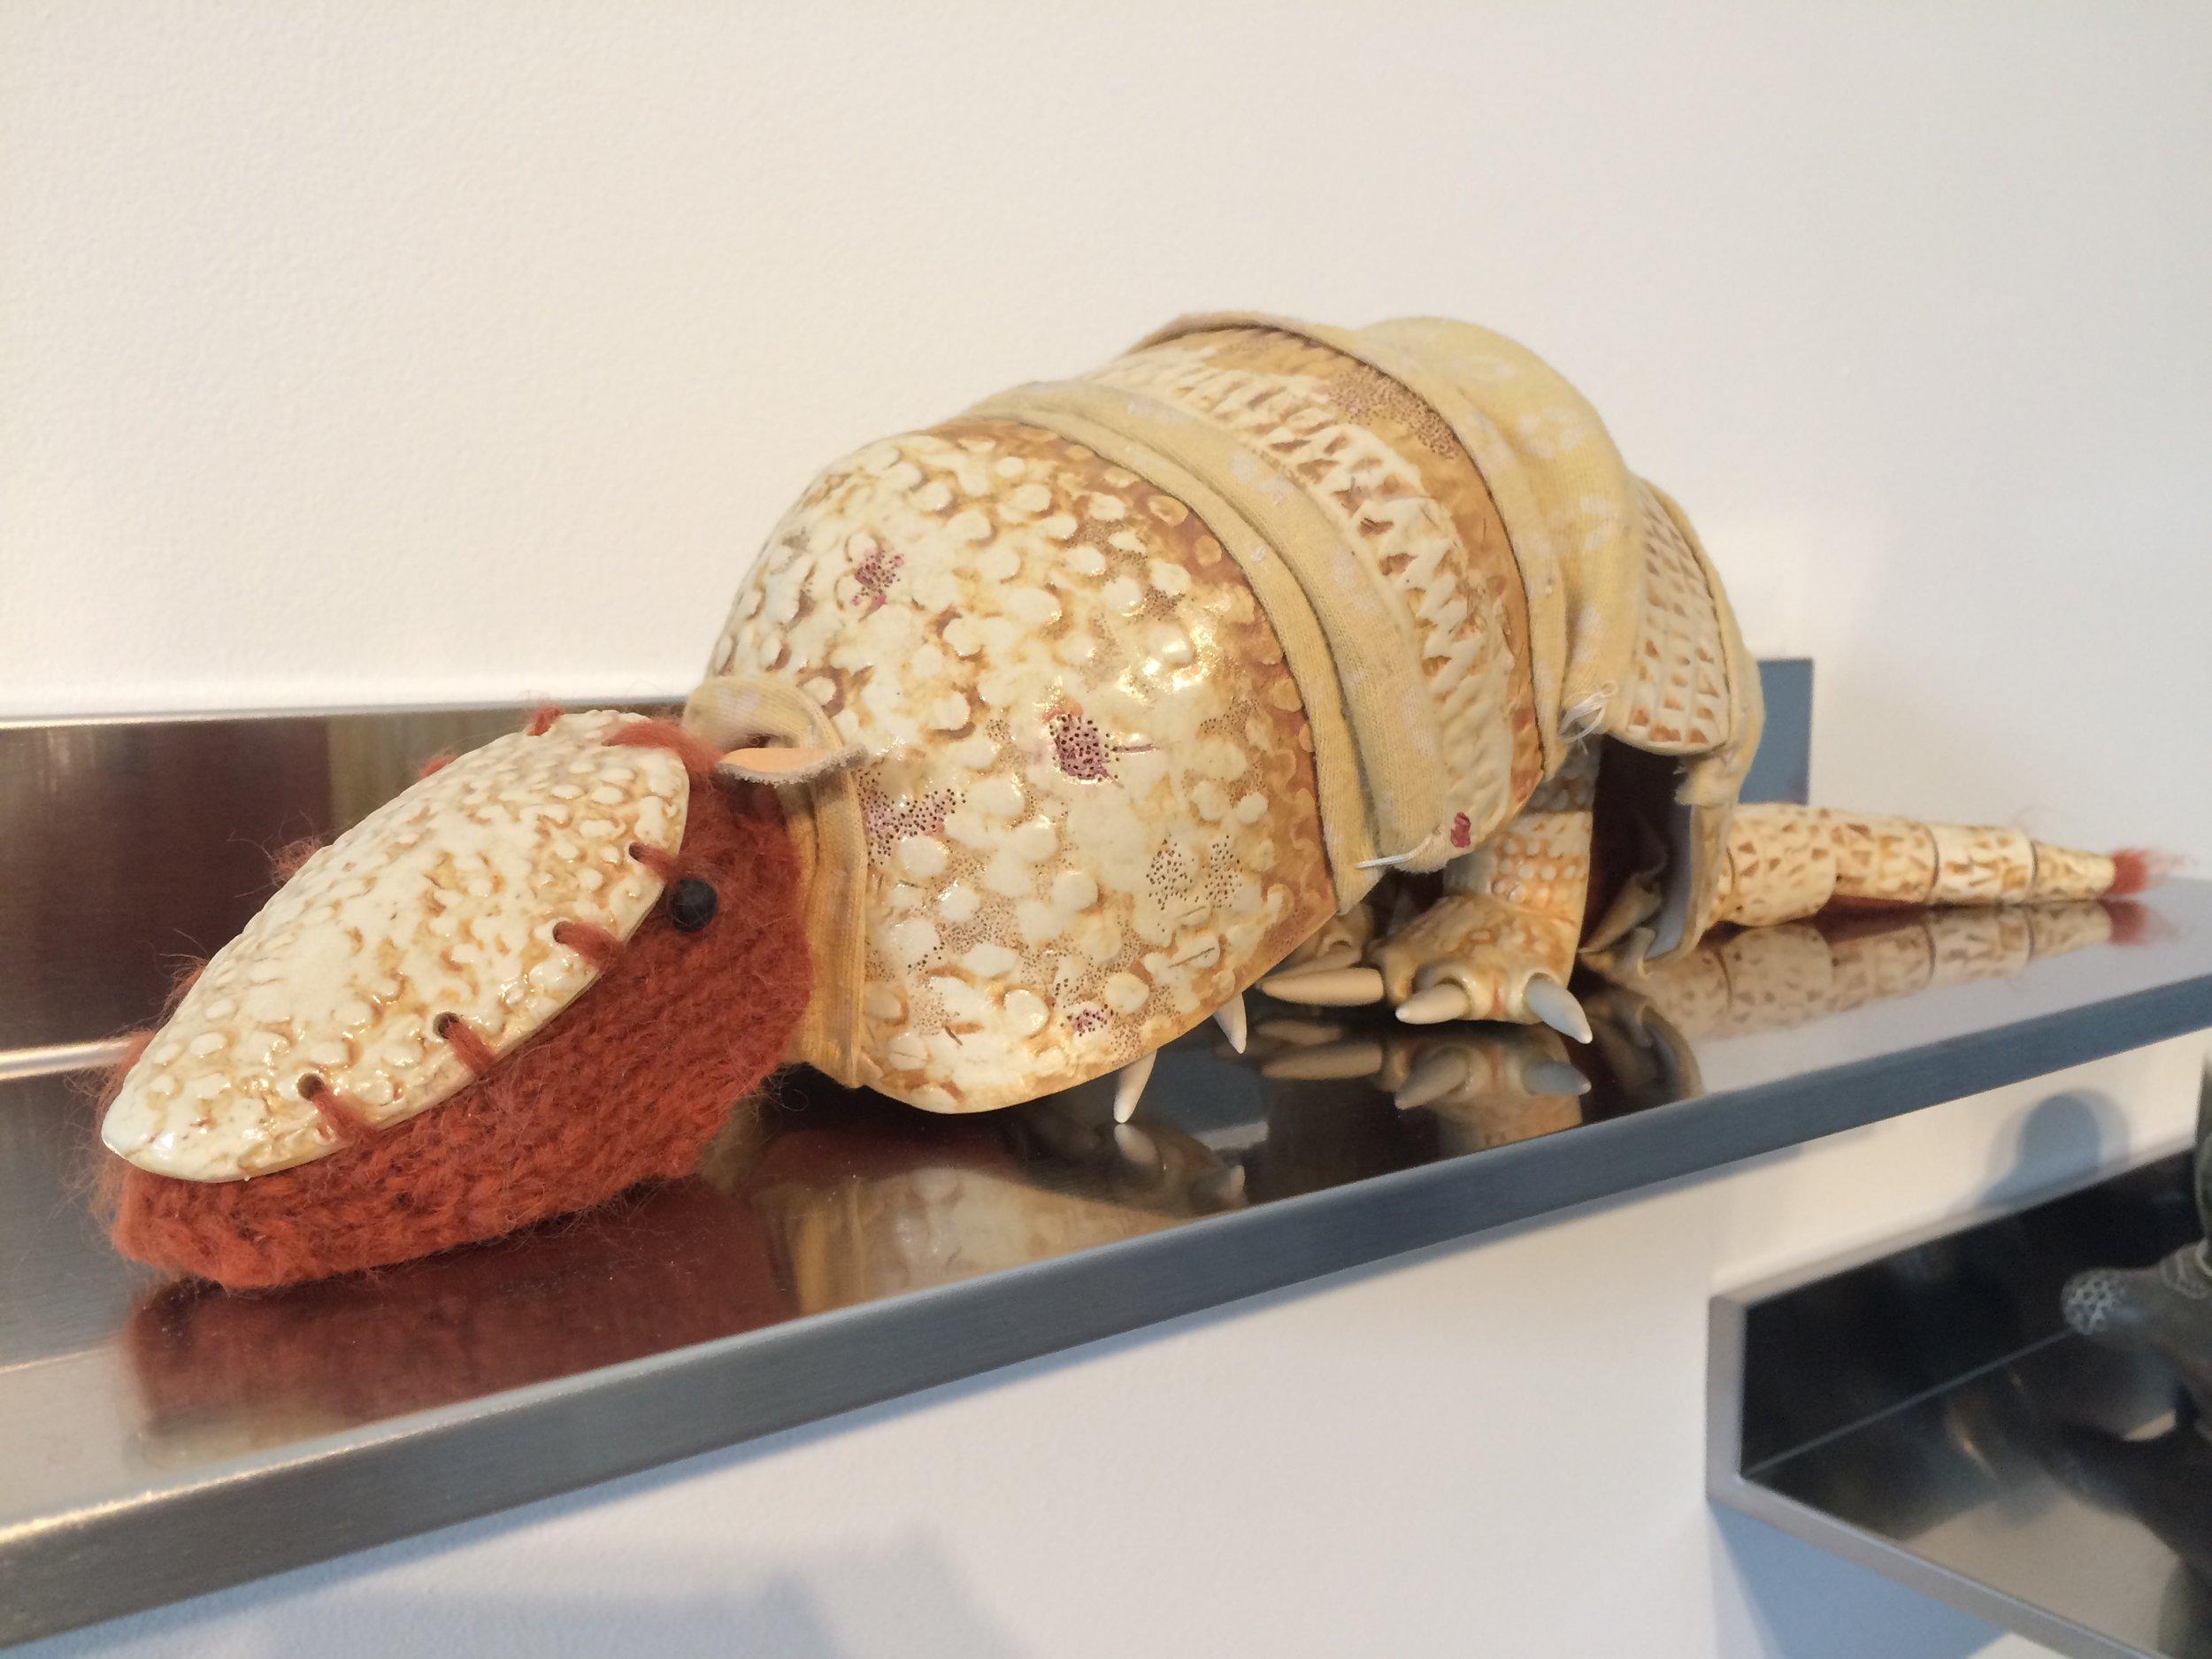 Armadillo  at the What Becomes  exhibition at Sanitary Tortilla Factory